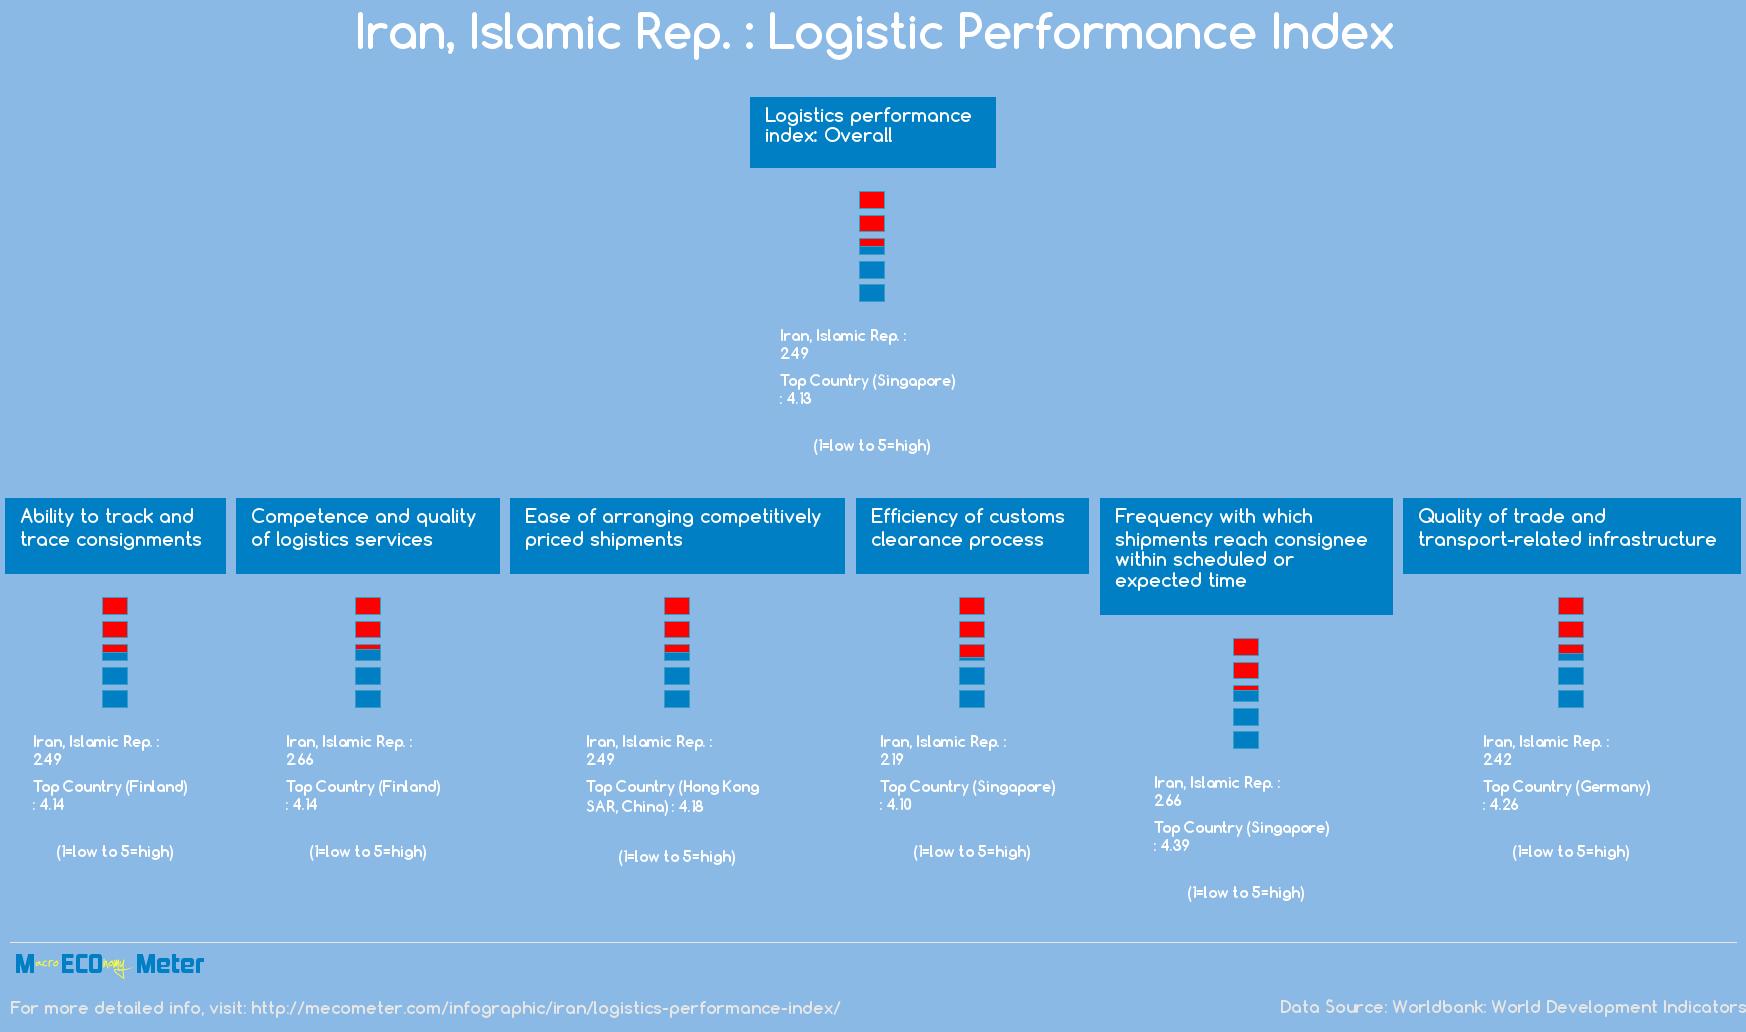 Iran, Islamic Rep. : Logistic Performance Index